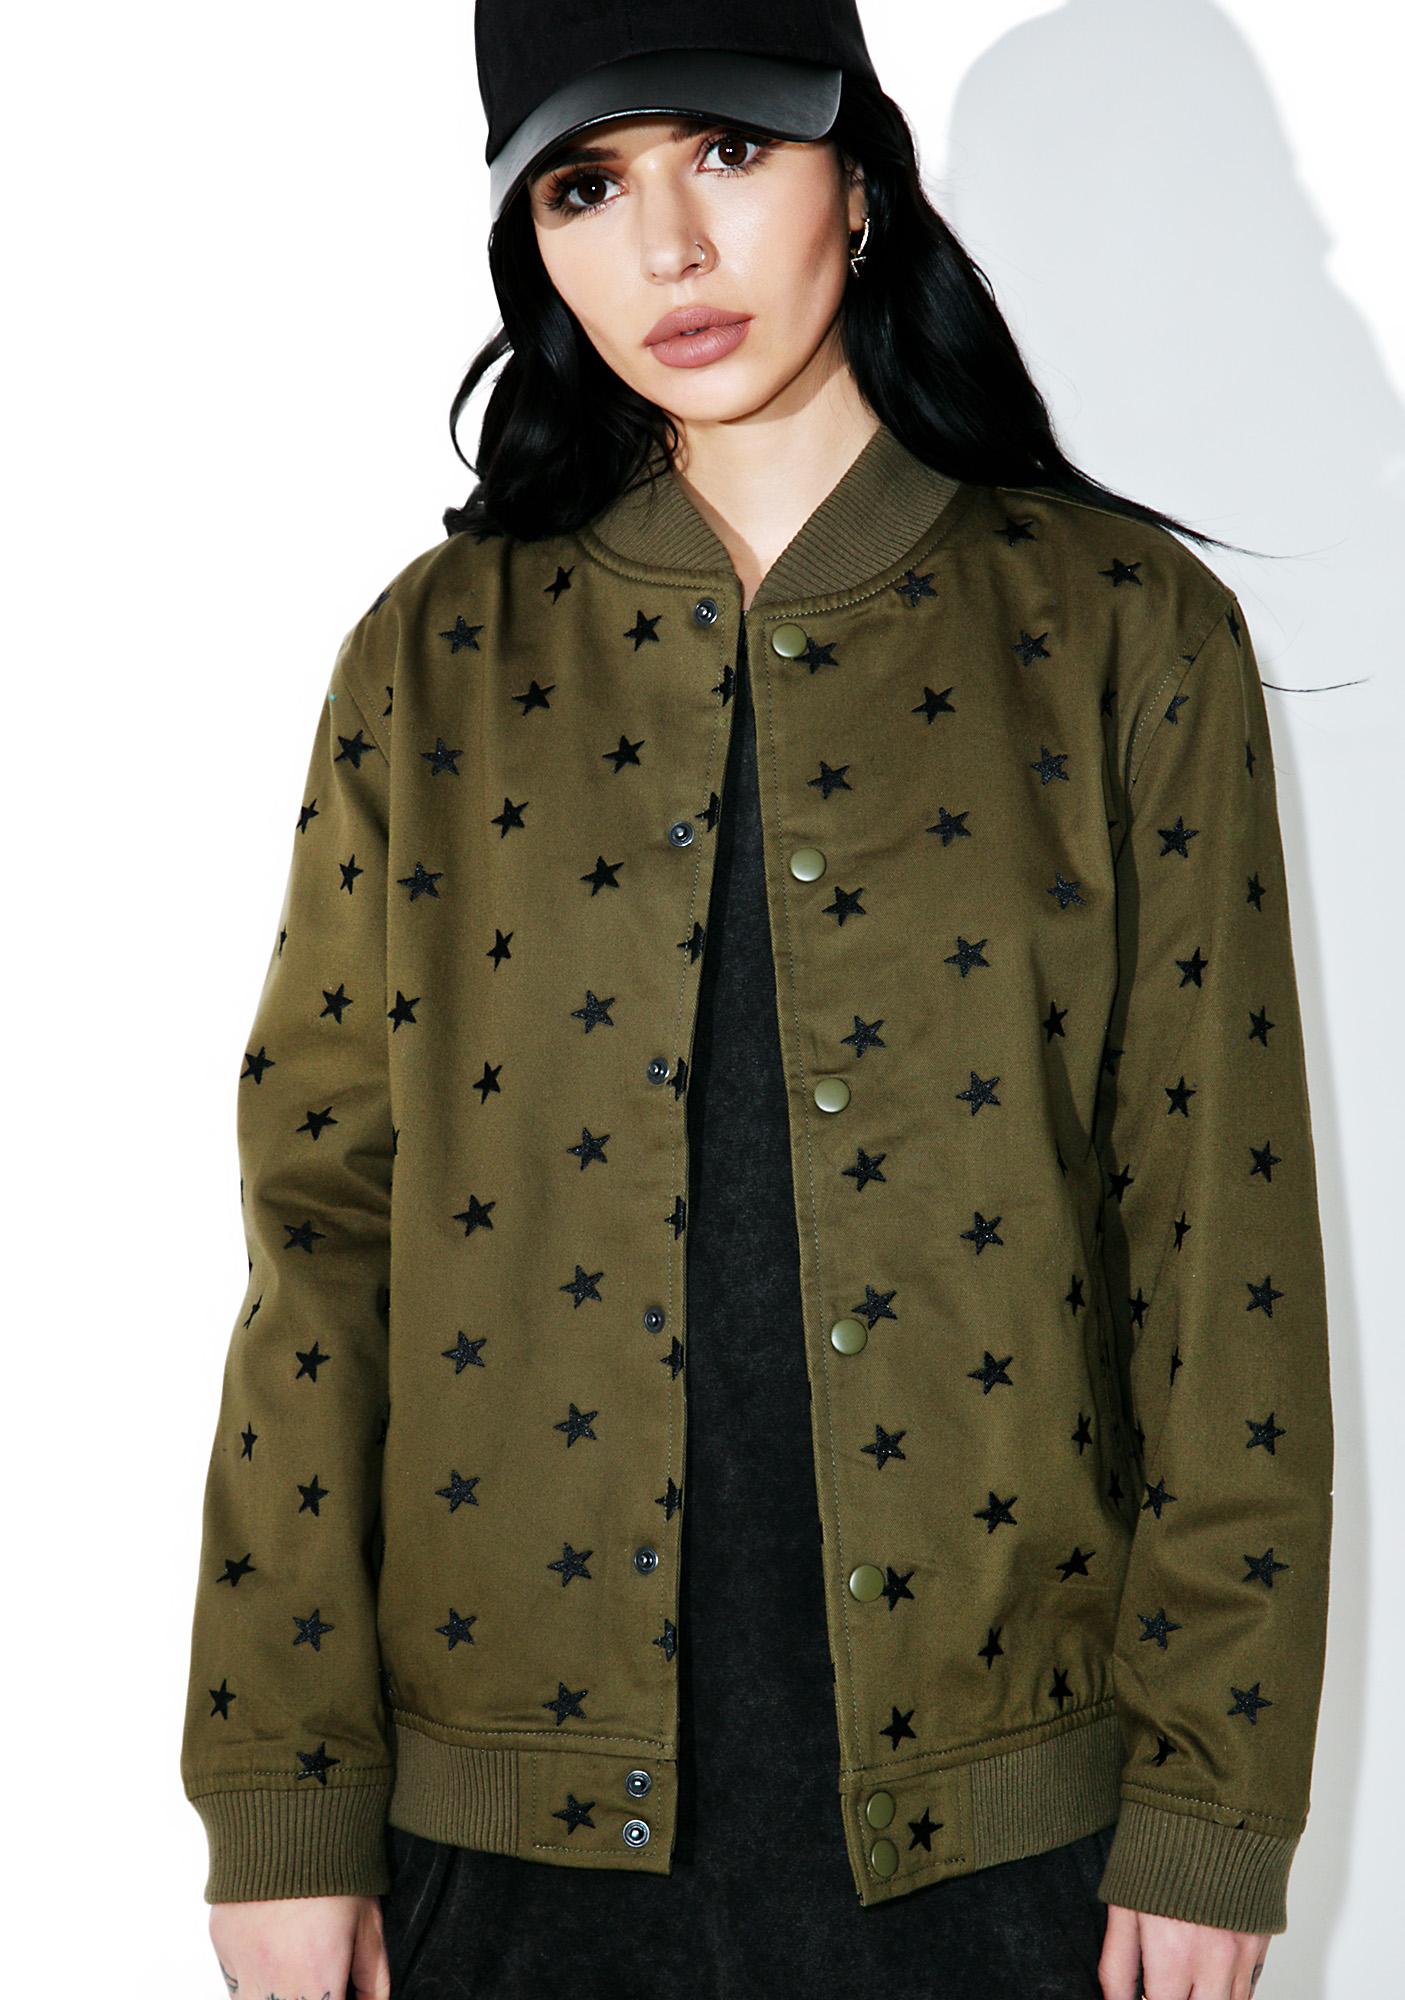 Black Scale Star Embroidered Varsity Jacket